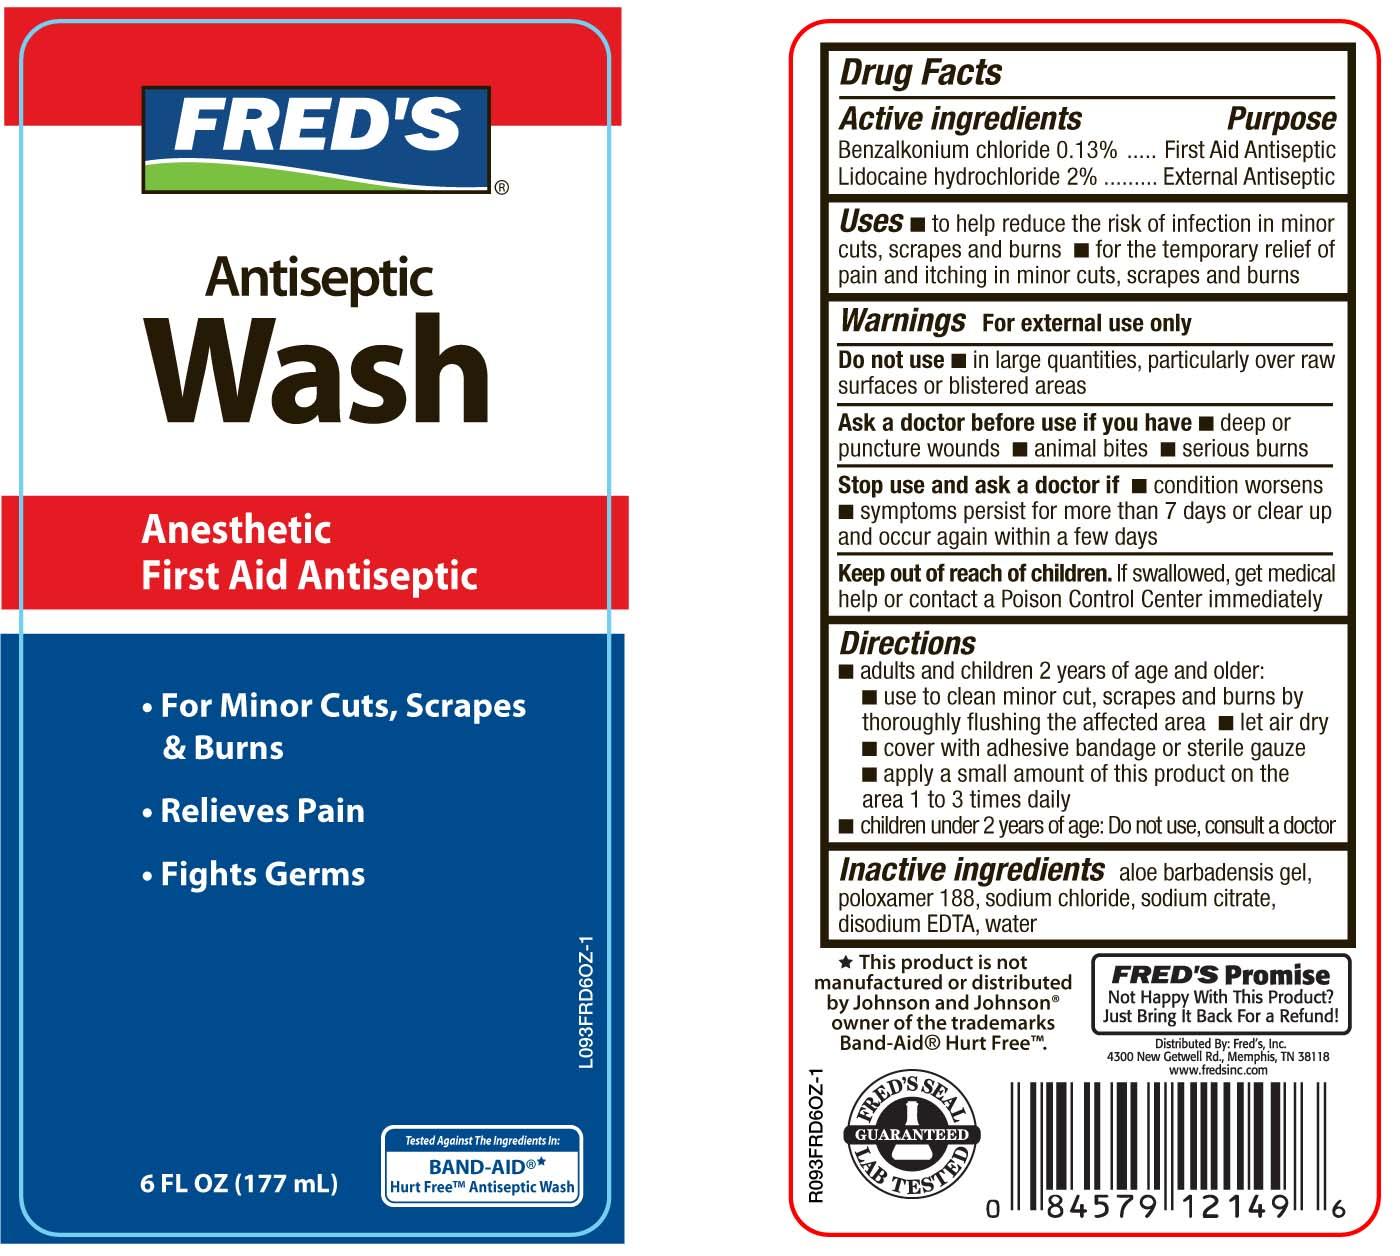 Freds Antiseptic Wash (Benzalkonium Chloride And Lidocaine Hydrochloride) Liquid [Pharma Pac, Llc]